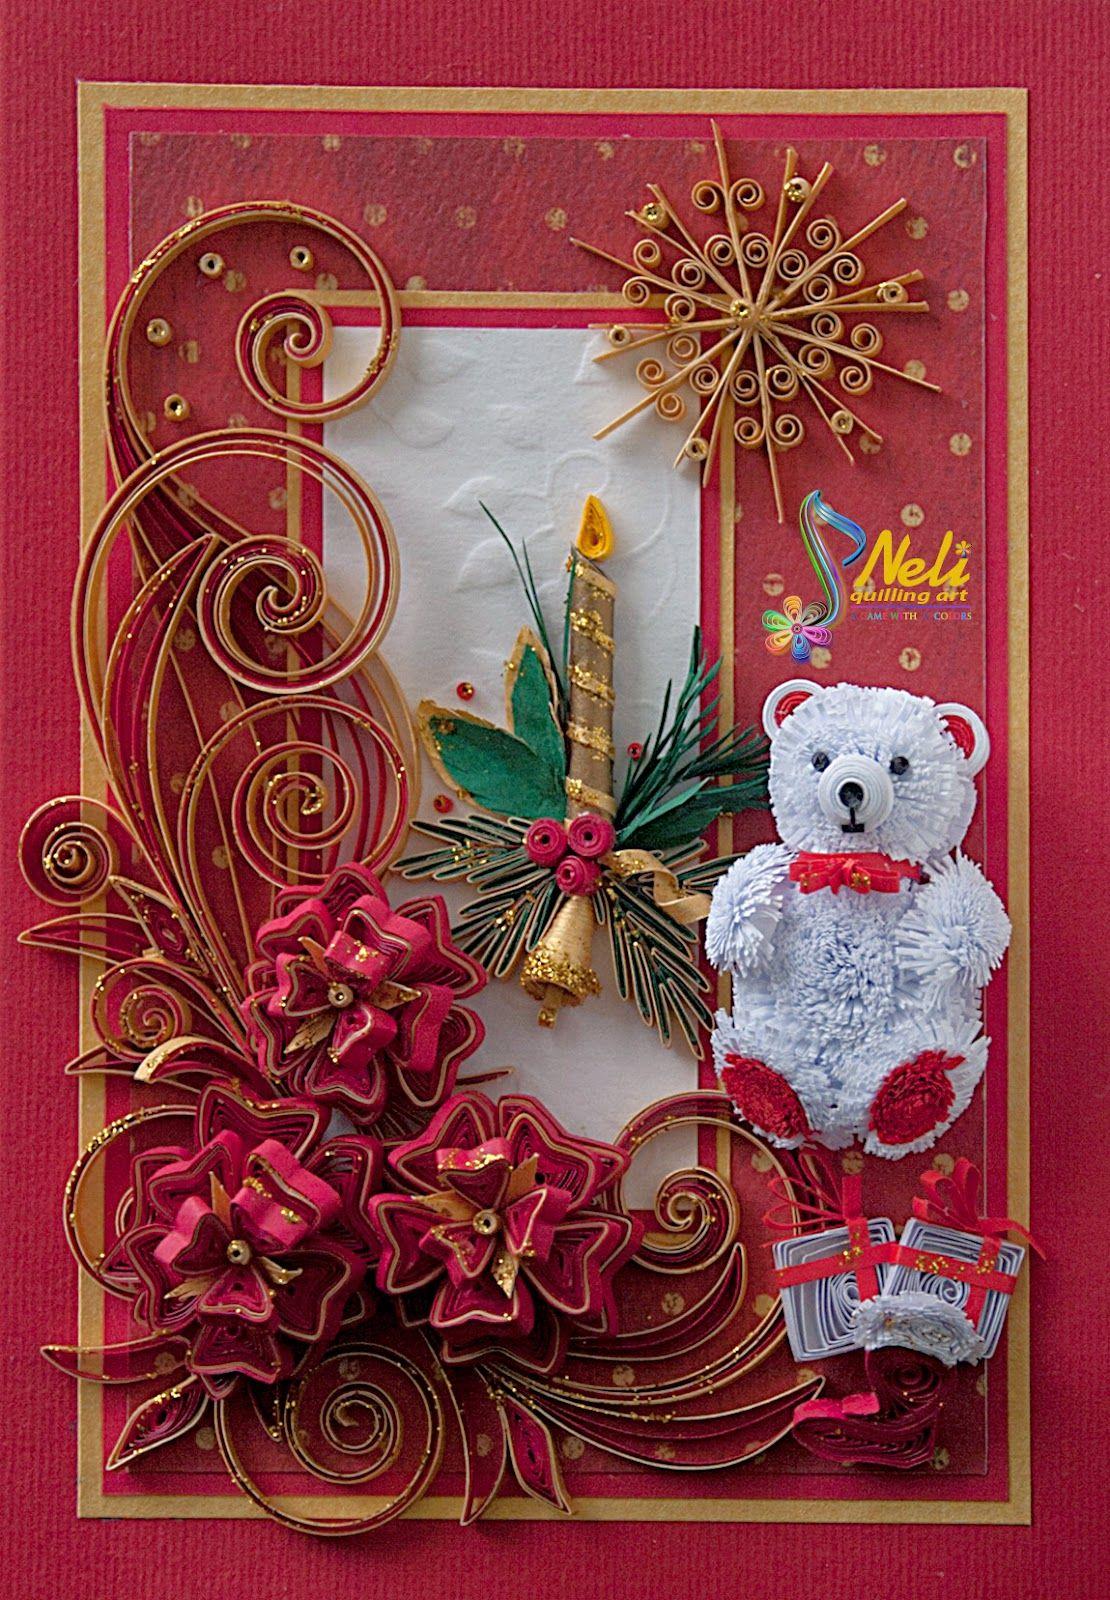 Neli quilling art preparation for christmas 11 2015 neli quilling art preparation for christmas 11 2015 m4hsunfo